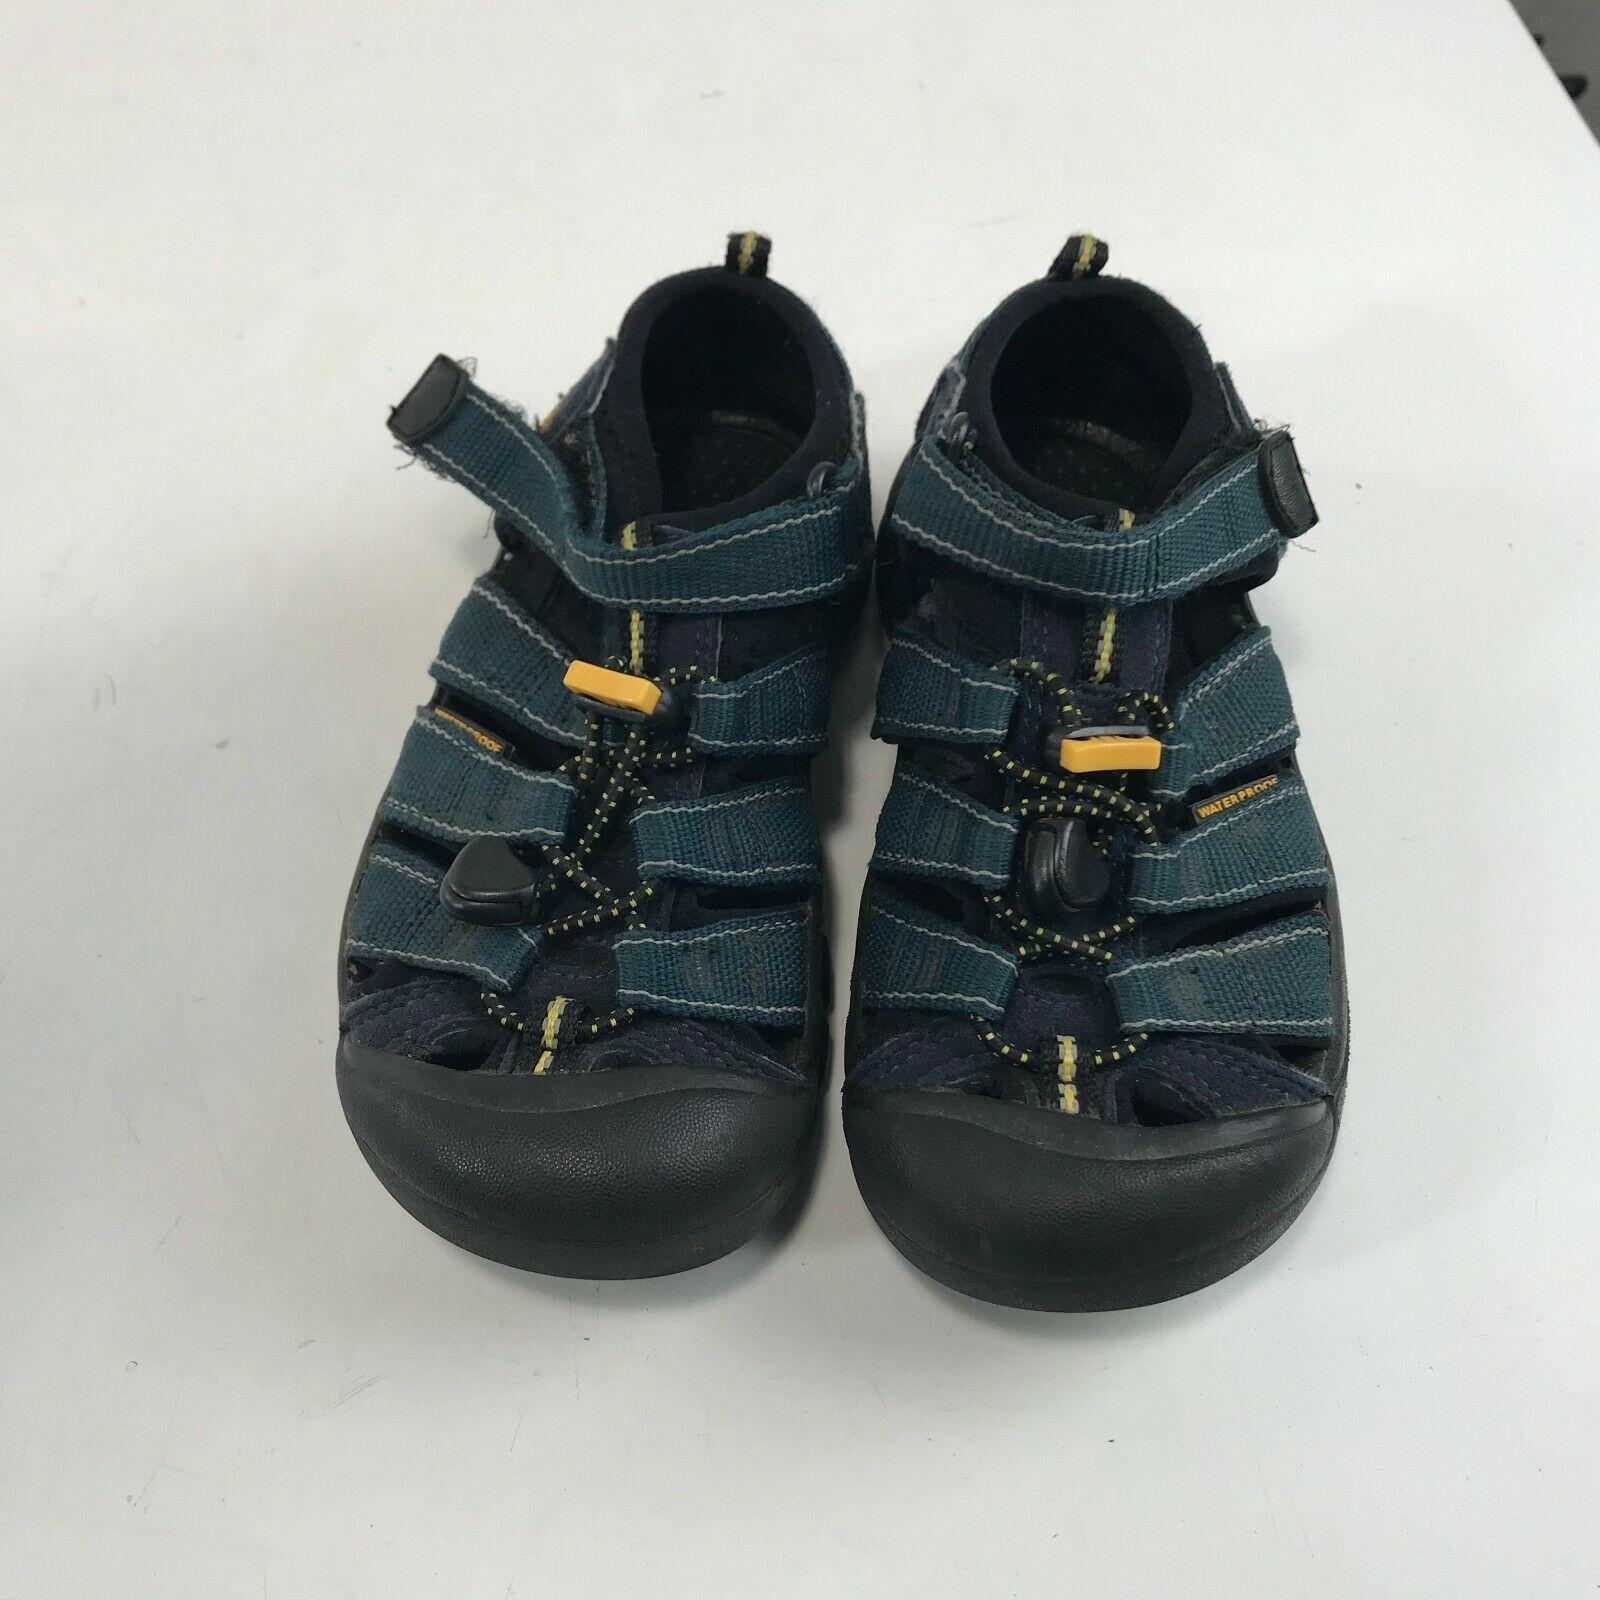 KEEN Newport Waterproof Sports Sandals Shoes Size 13 Boy Toddler image 3